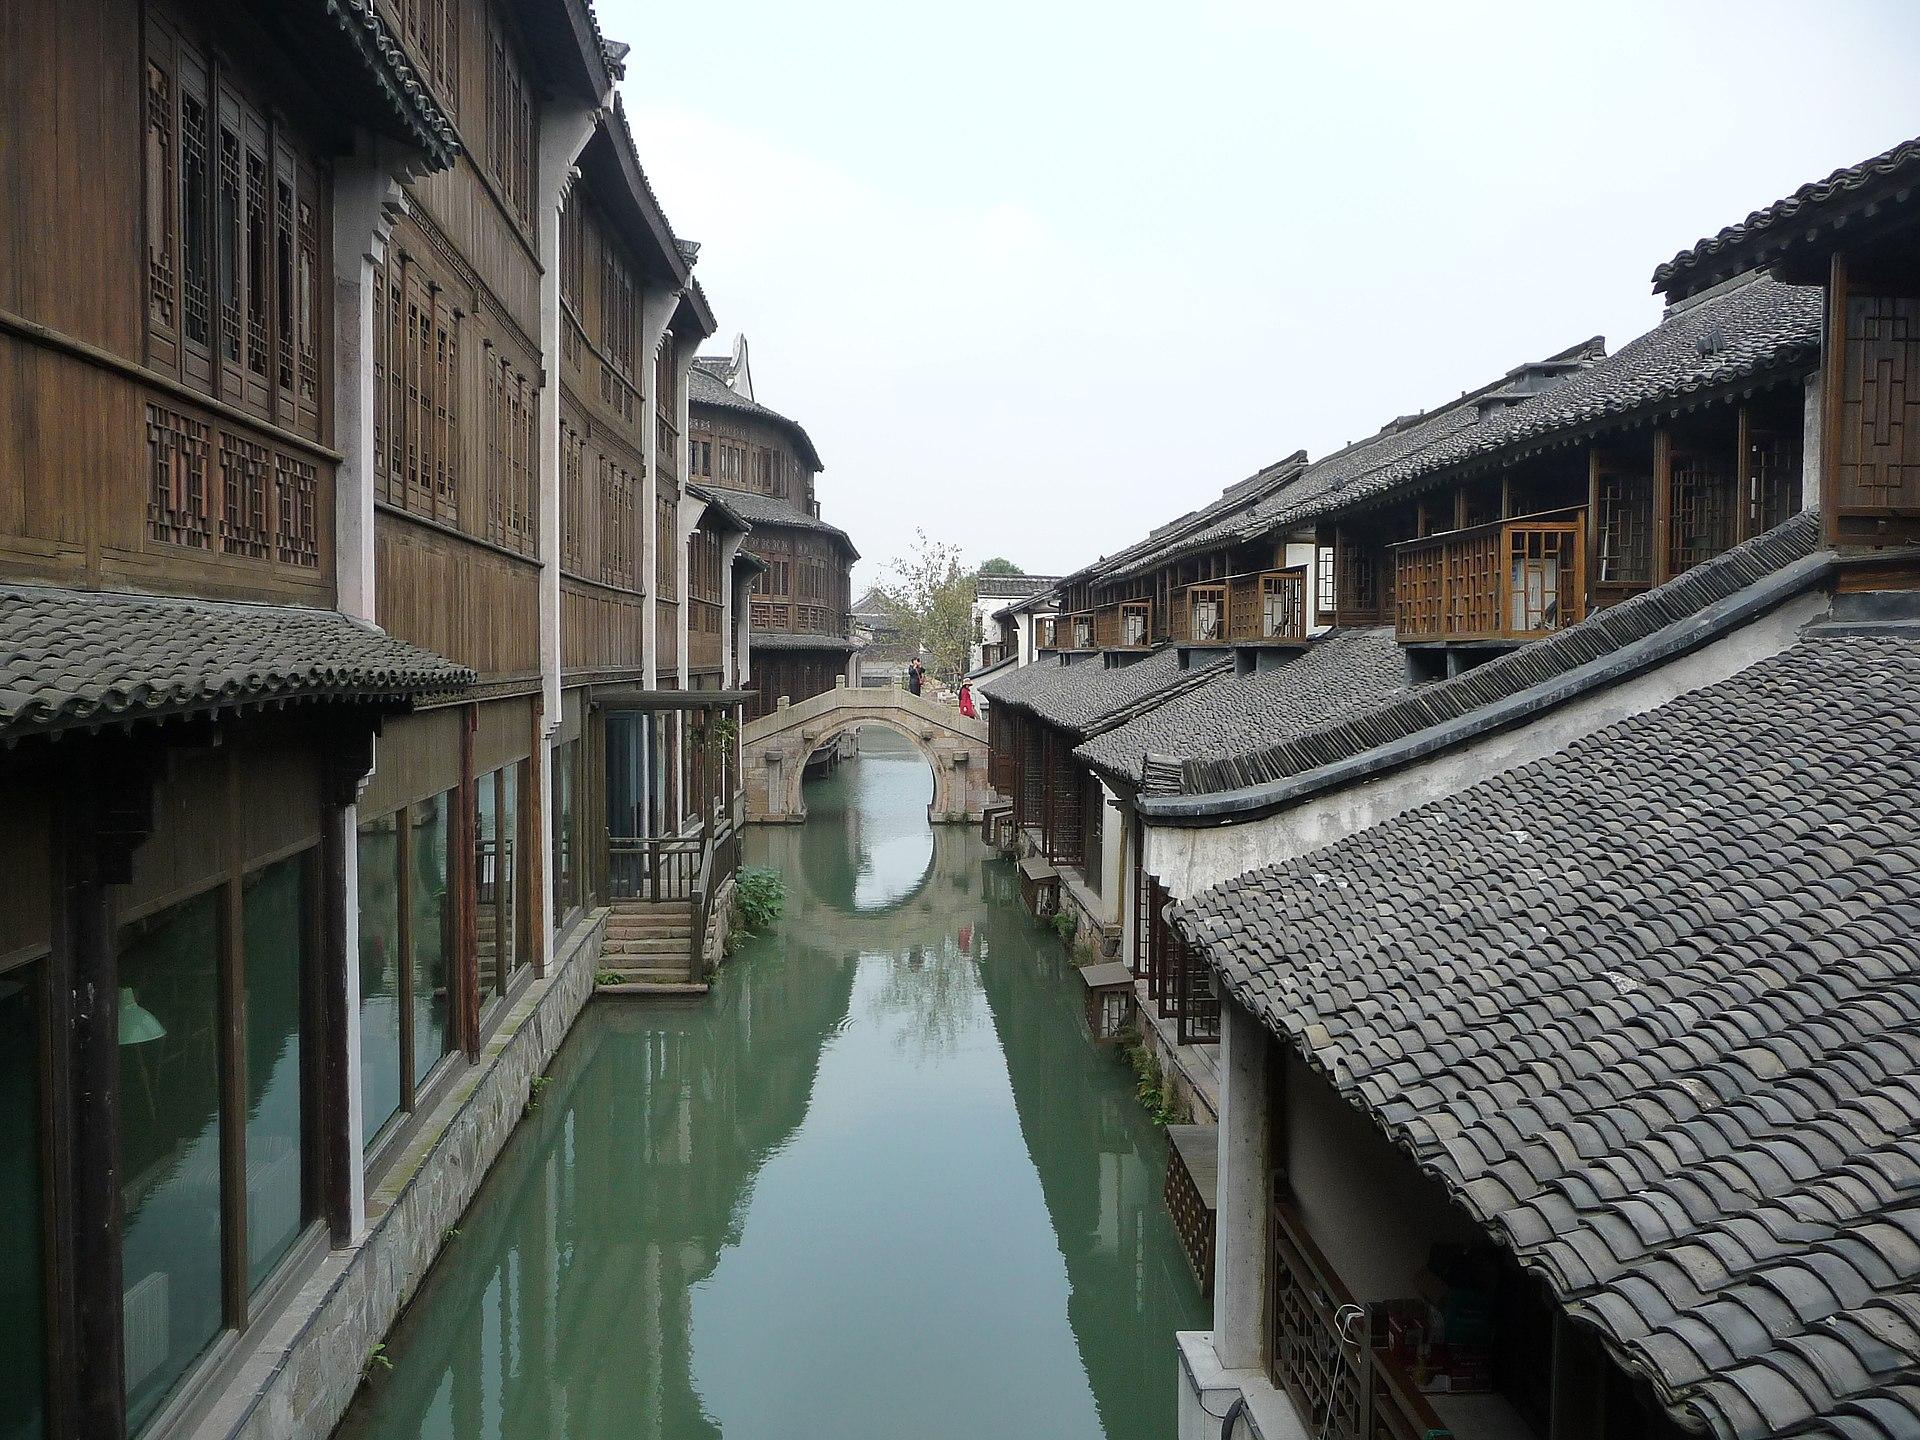 Chinese shanghai 2014 1 - 4 10